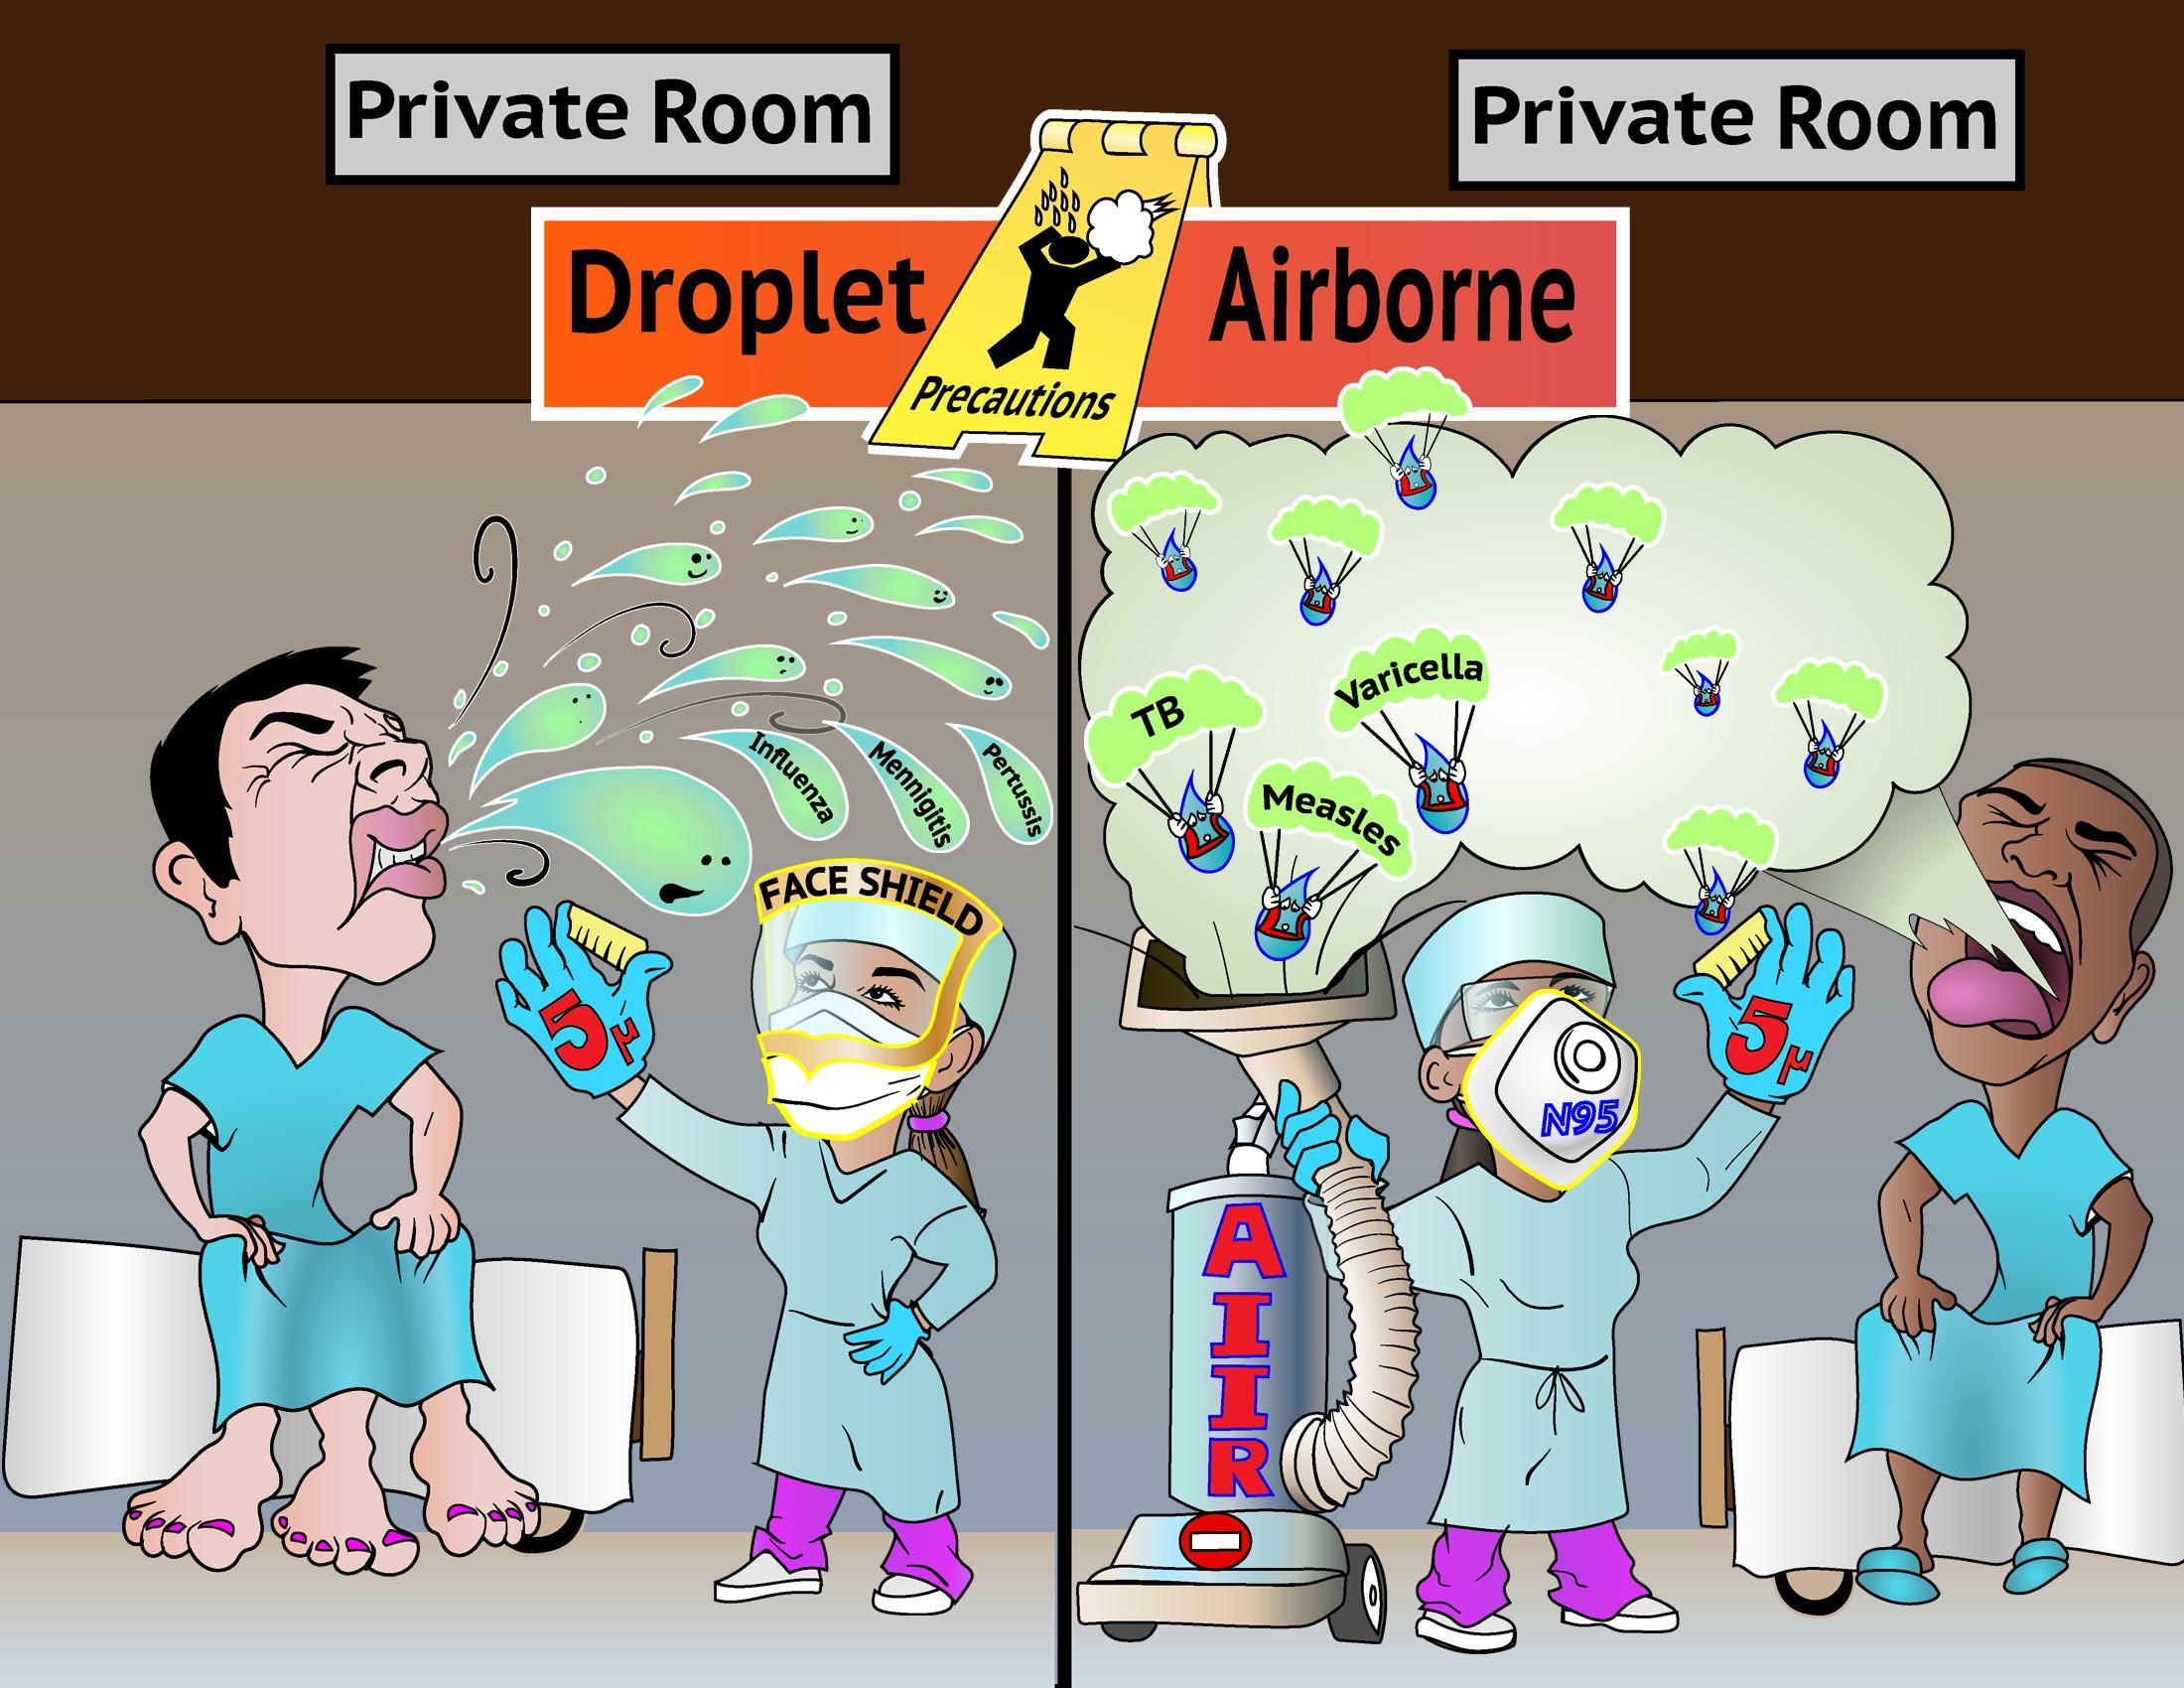 Droplet-Airborne Precautions